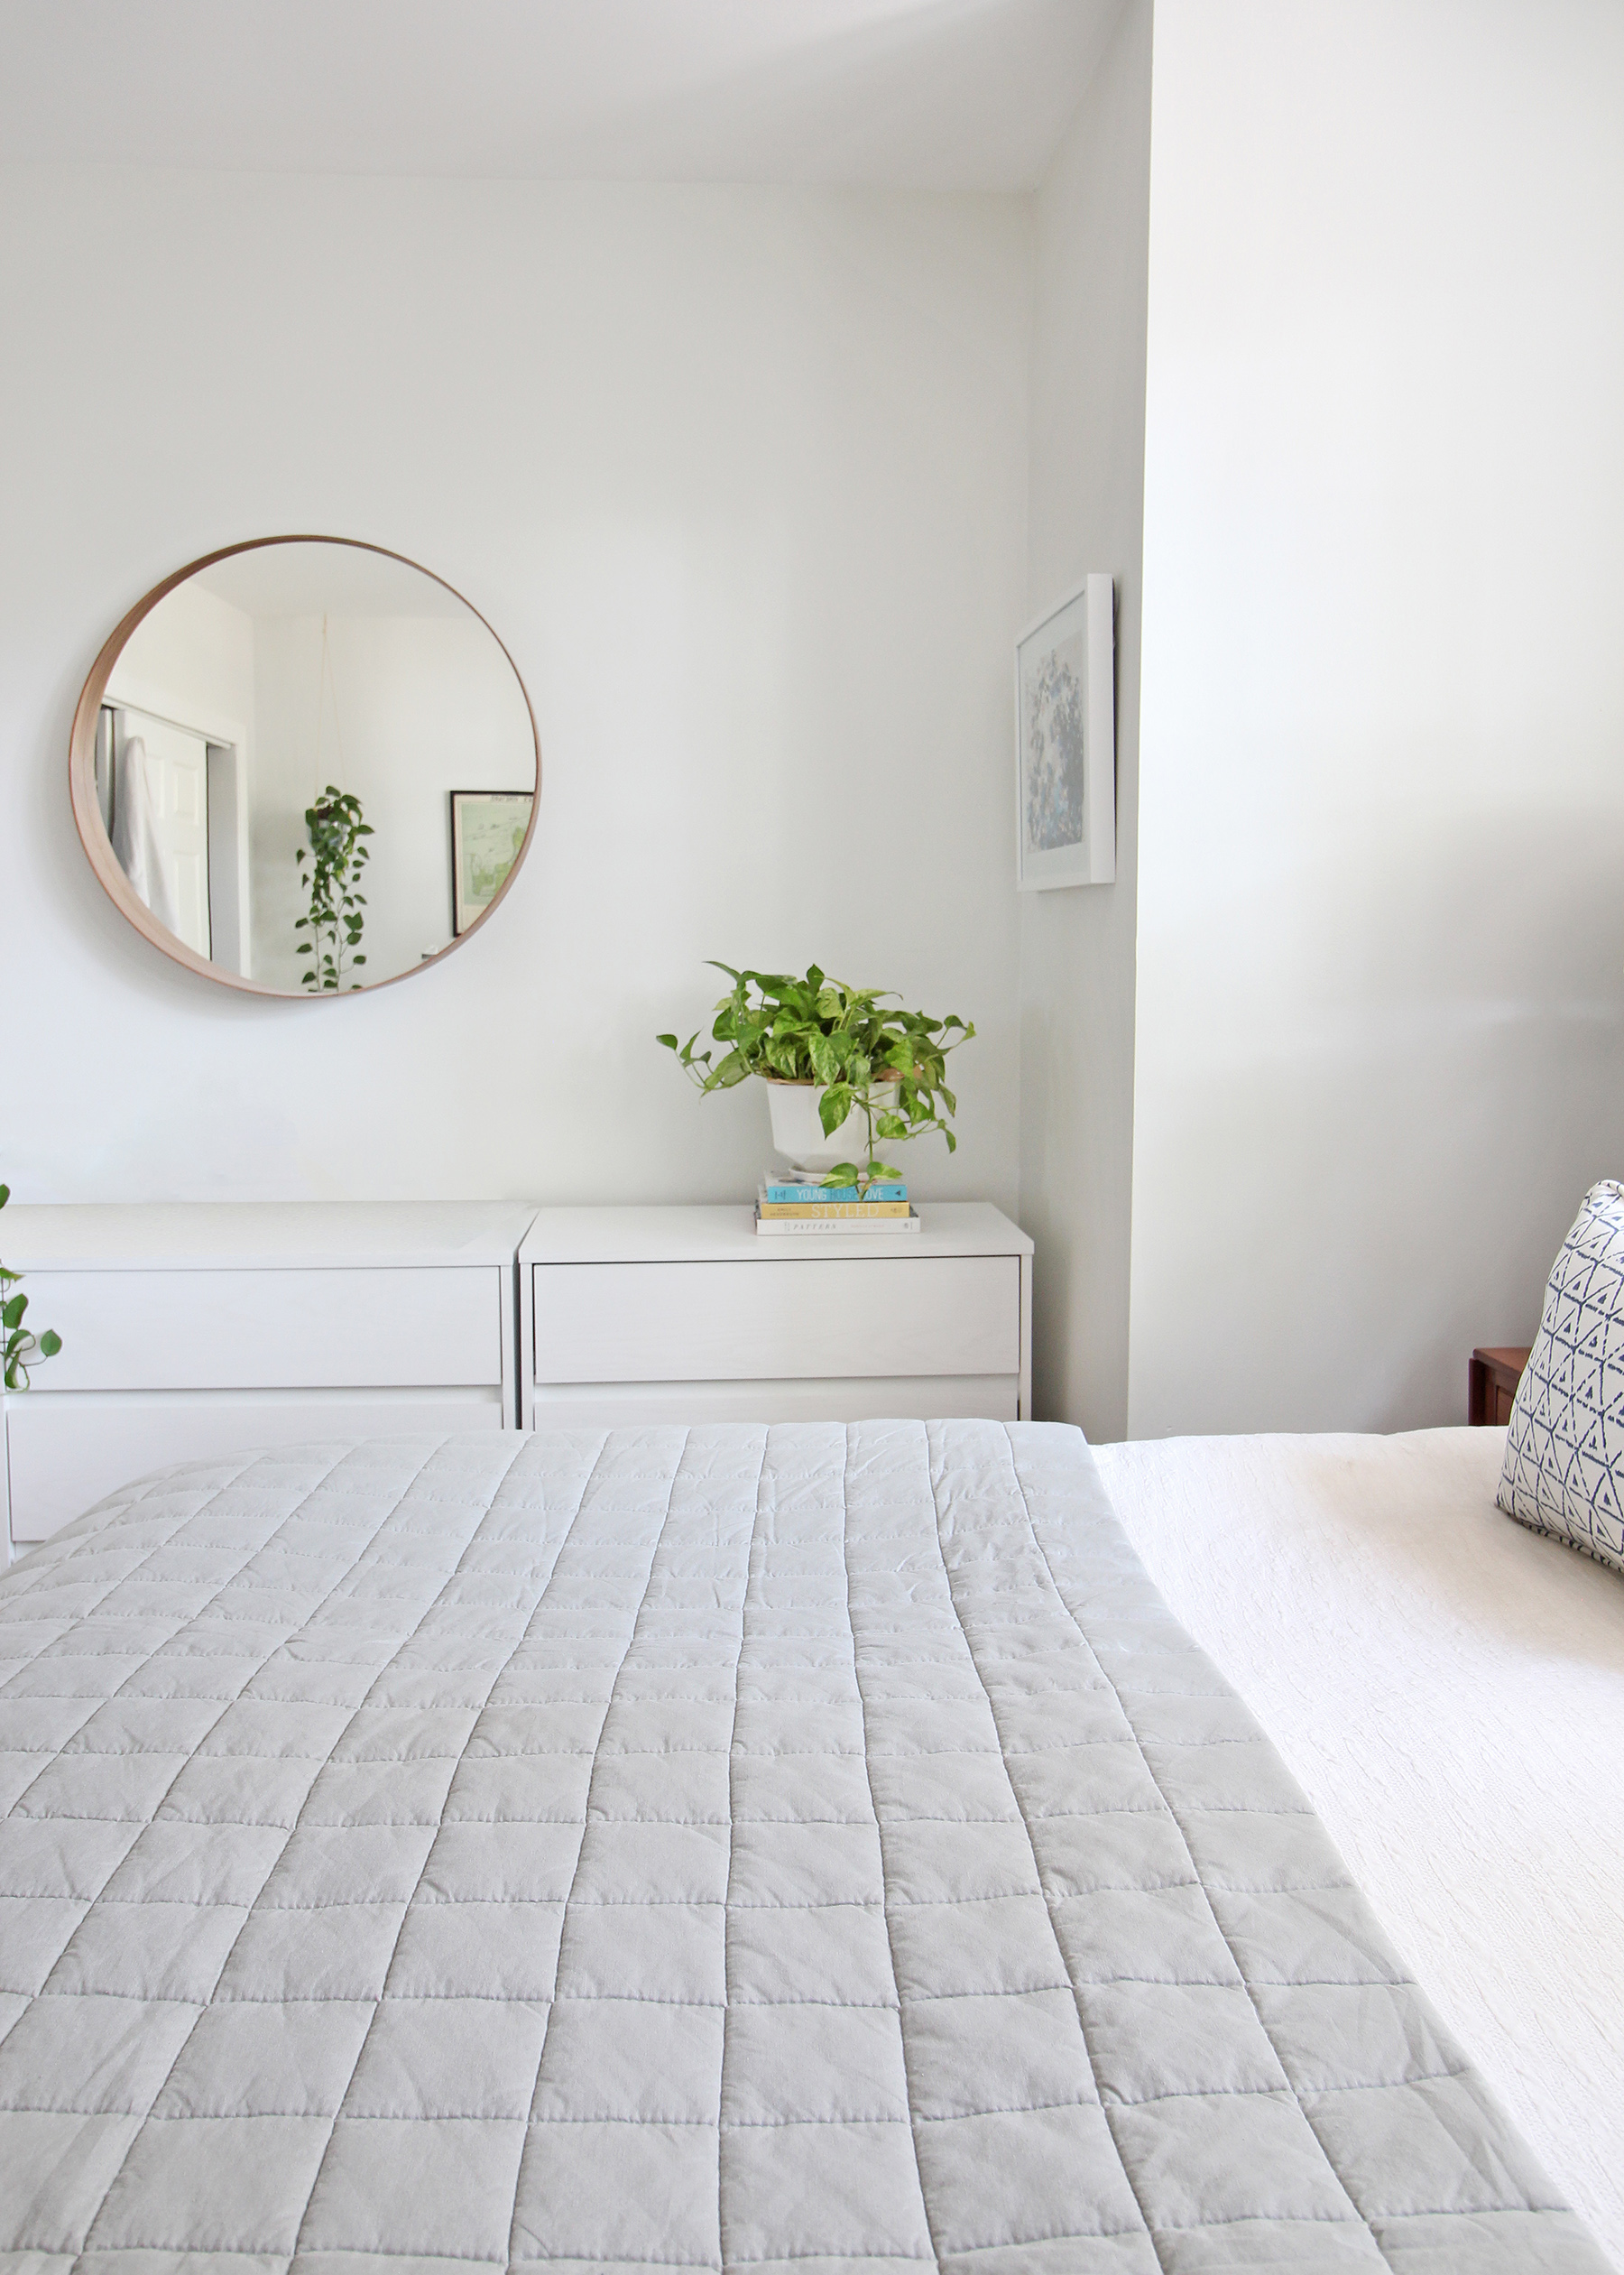 Modern-Eclectic-Bedroom-Refresh-Legrand-USB-Outlet-Web-5.jpg